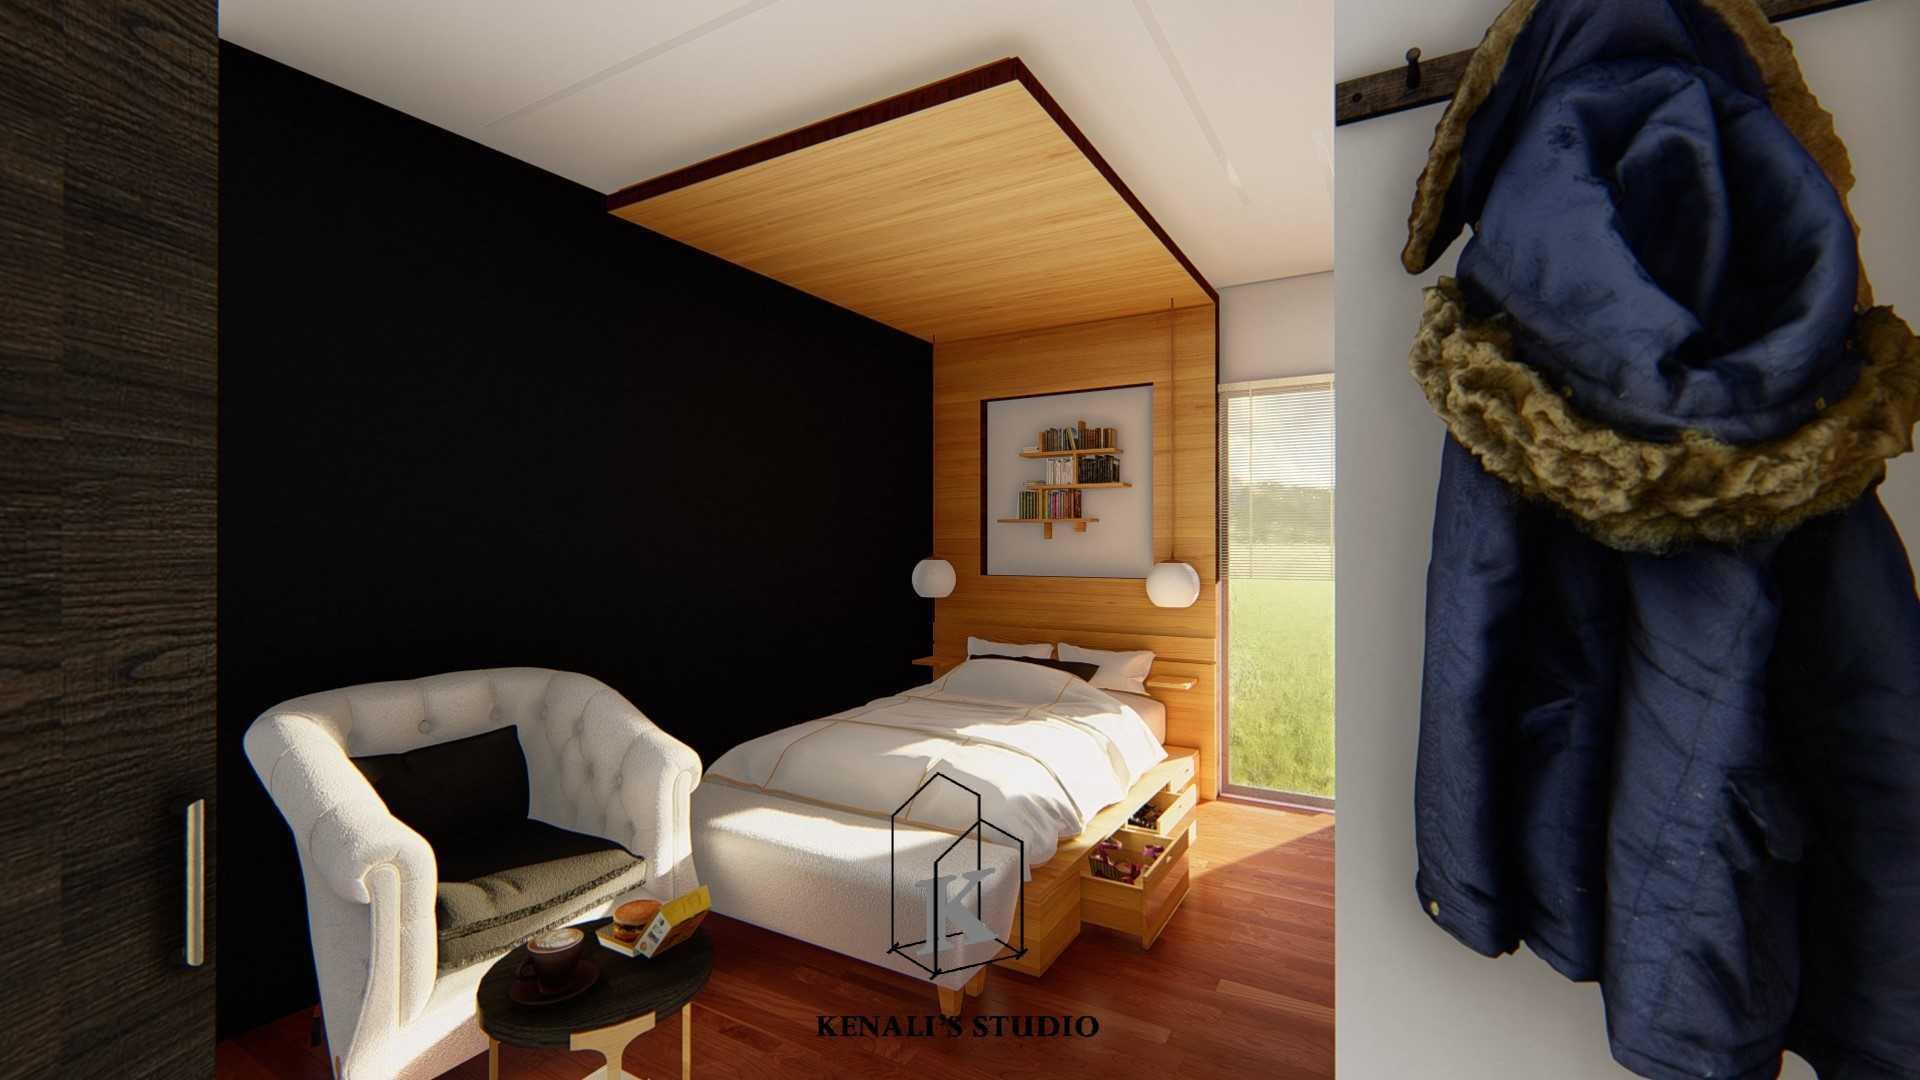 Kenali's Studio Project : Lowlit Bedroom Italia Italia Kenalis-Studio-Project-Lowlit-Bedroom  72924